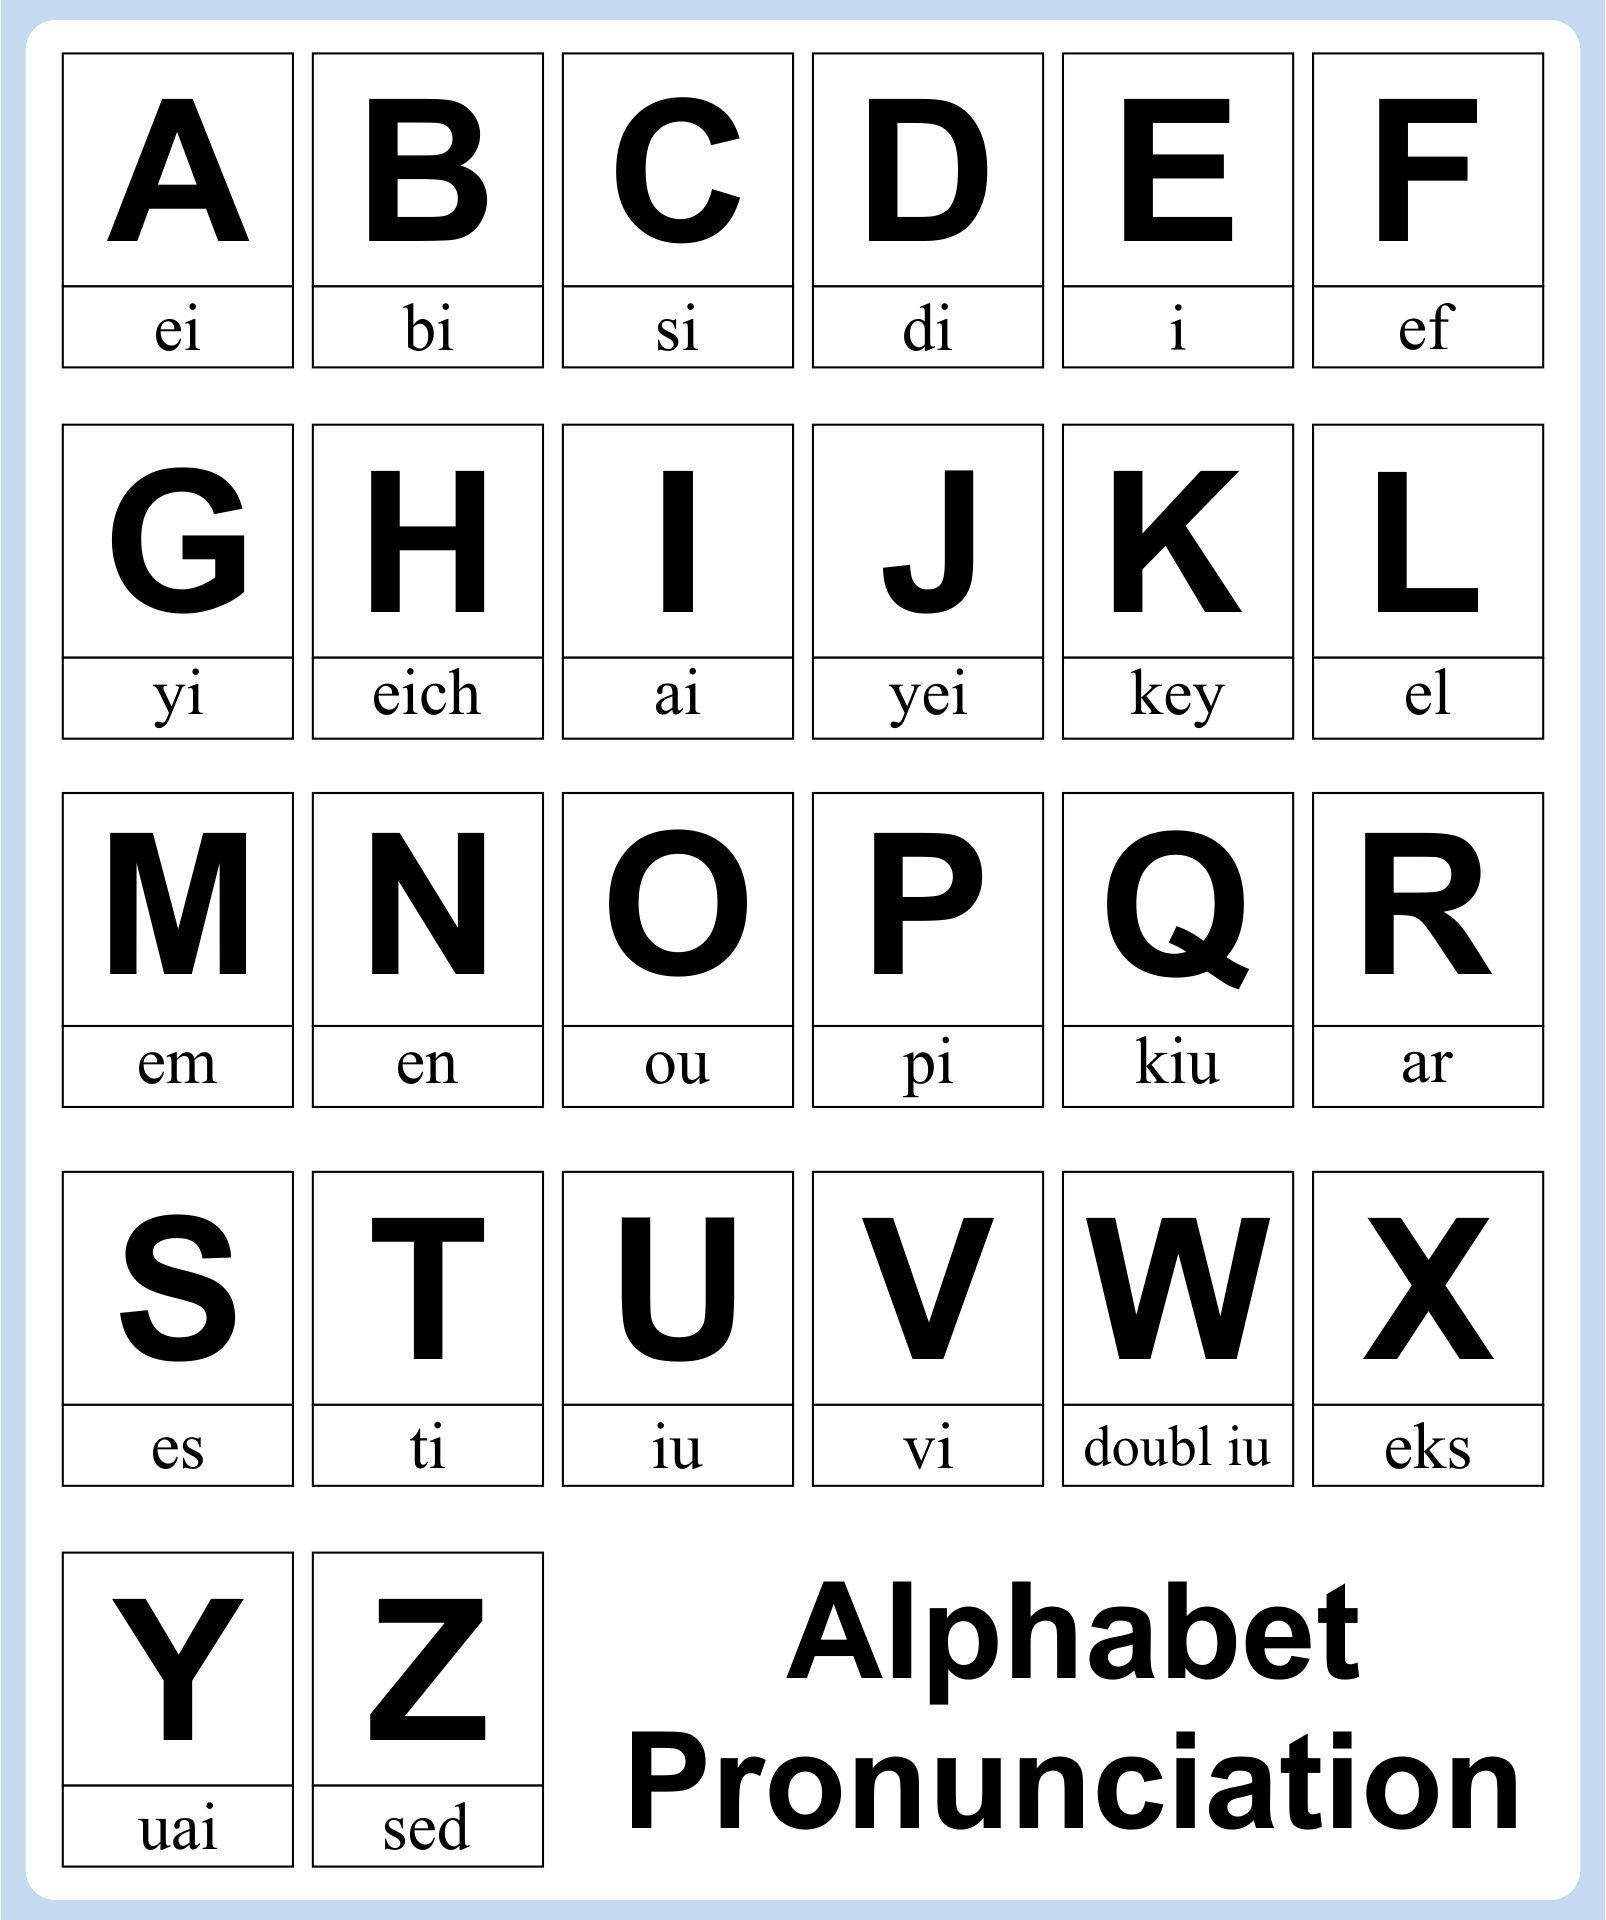 Alphabet Pronunciation Chart English